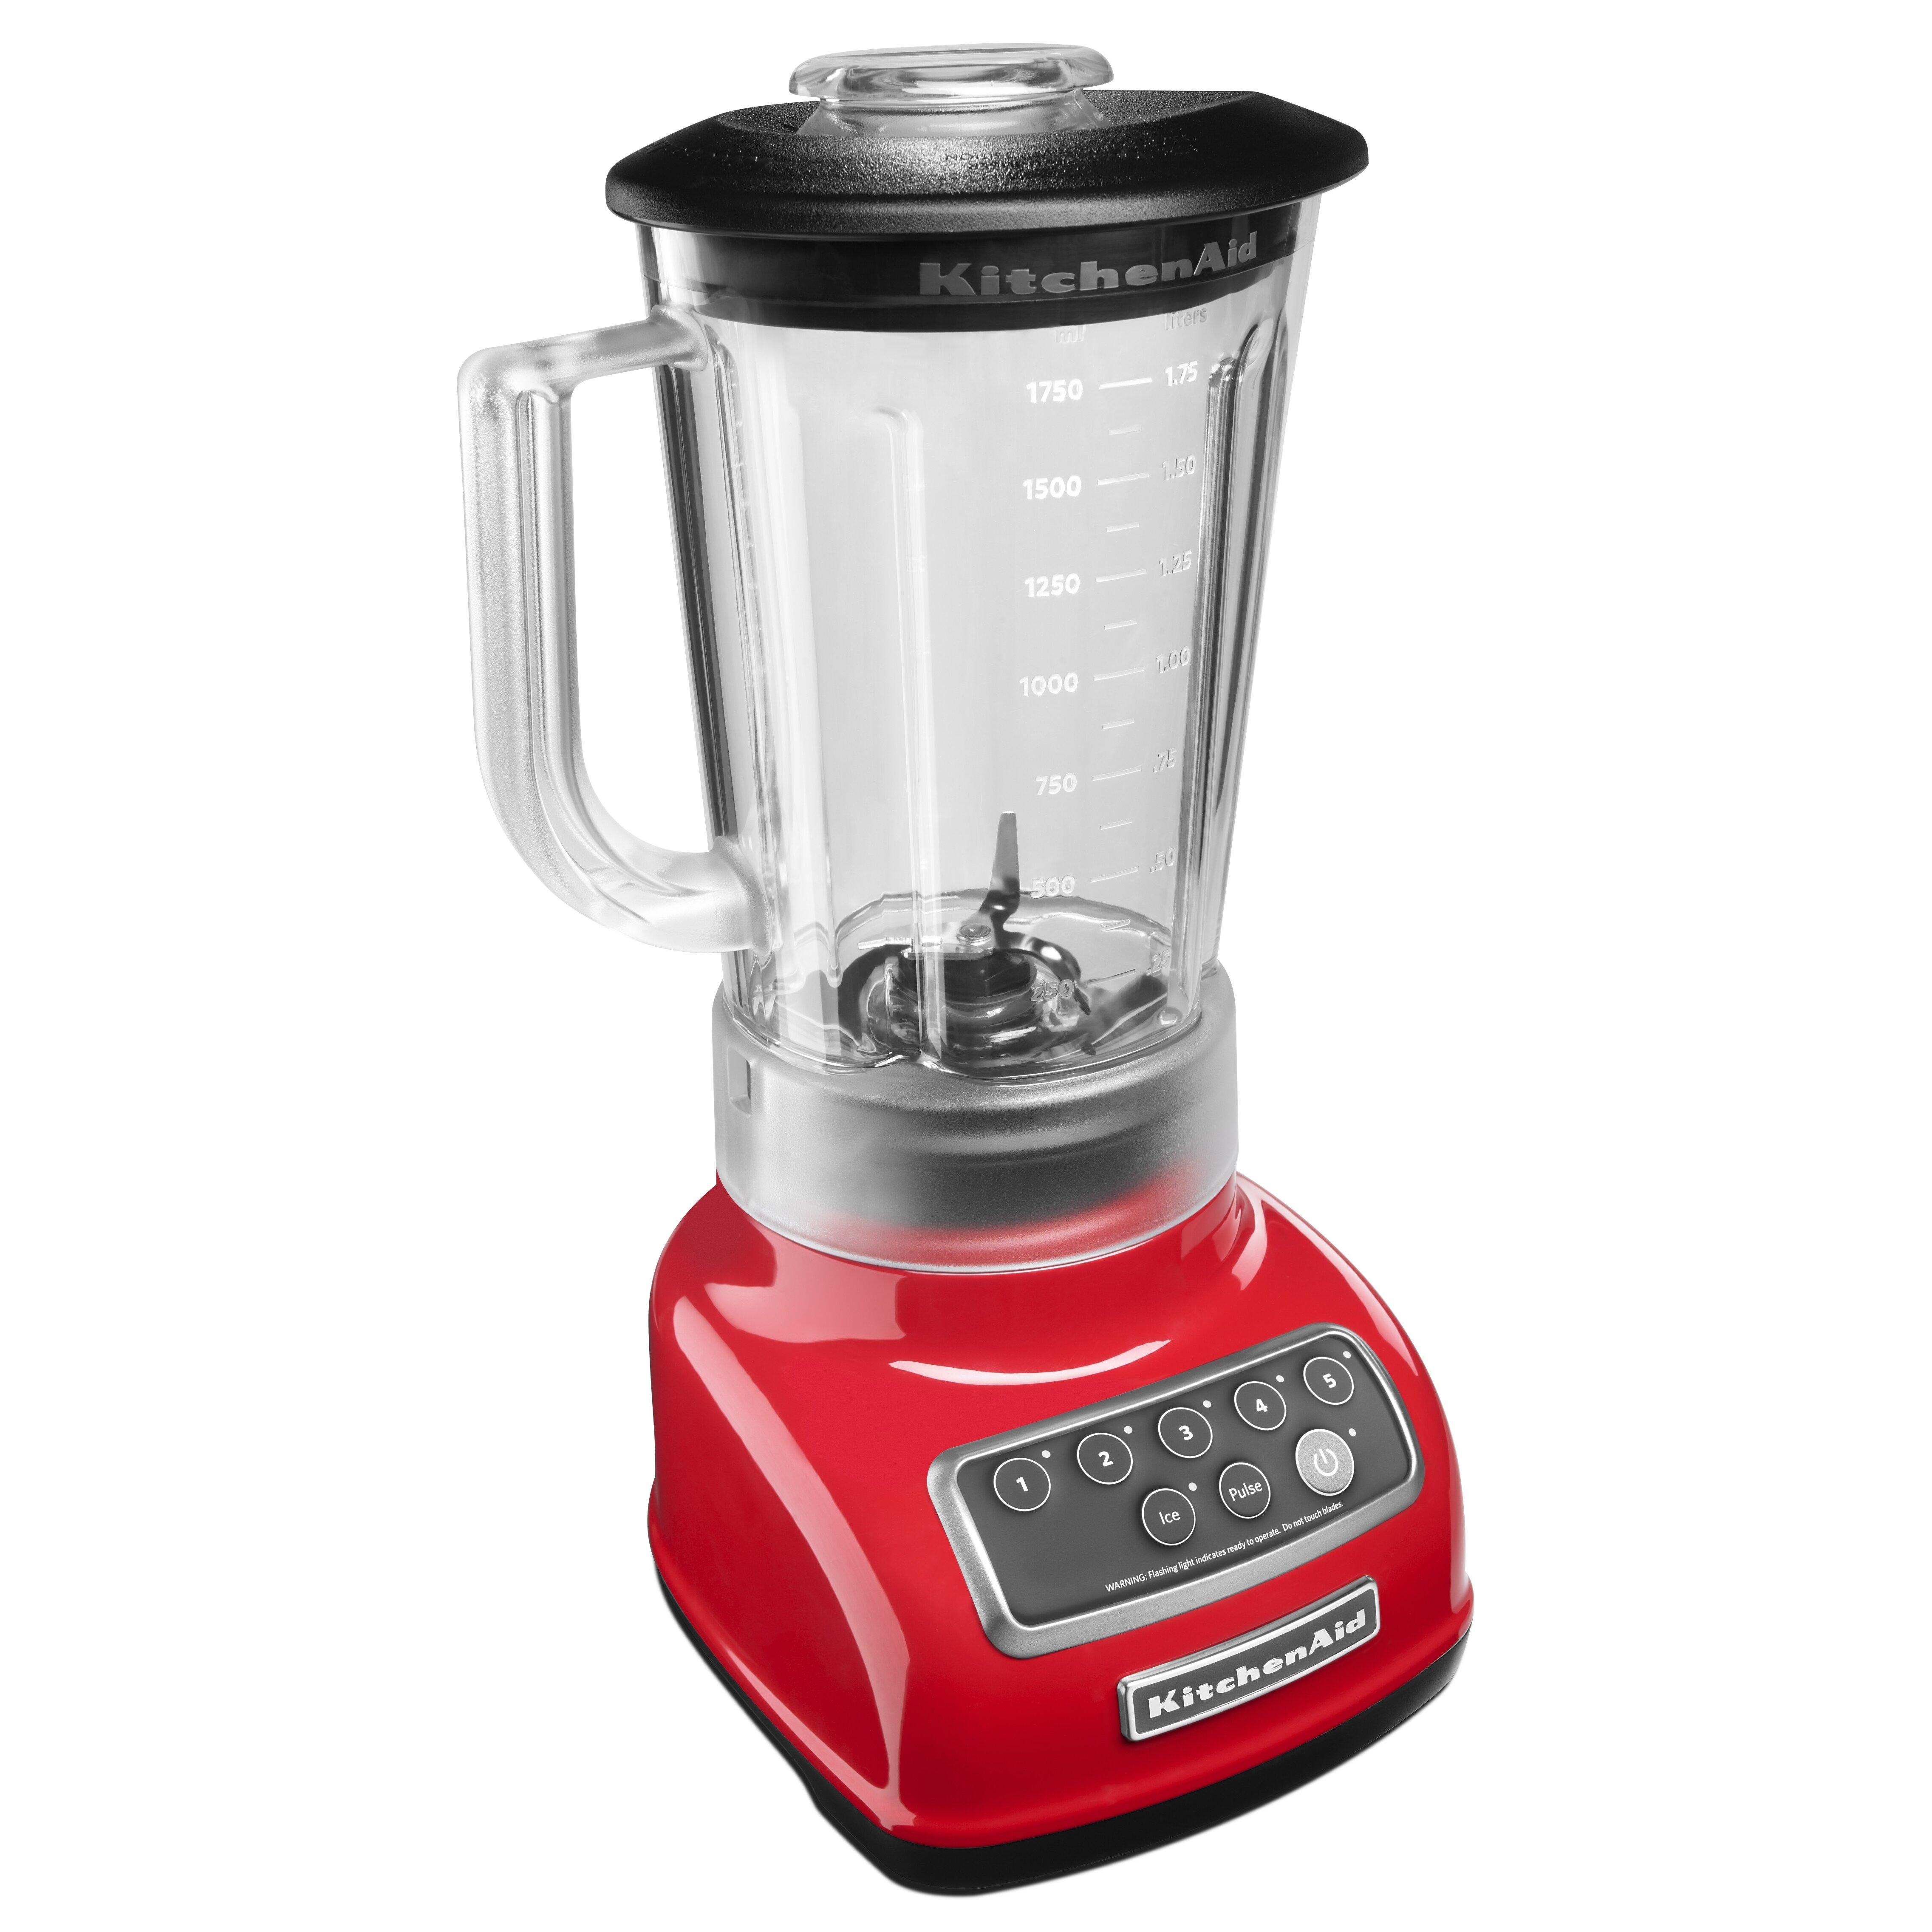 kitchenaid food processor overheating - Kitchen Design